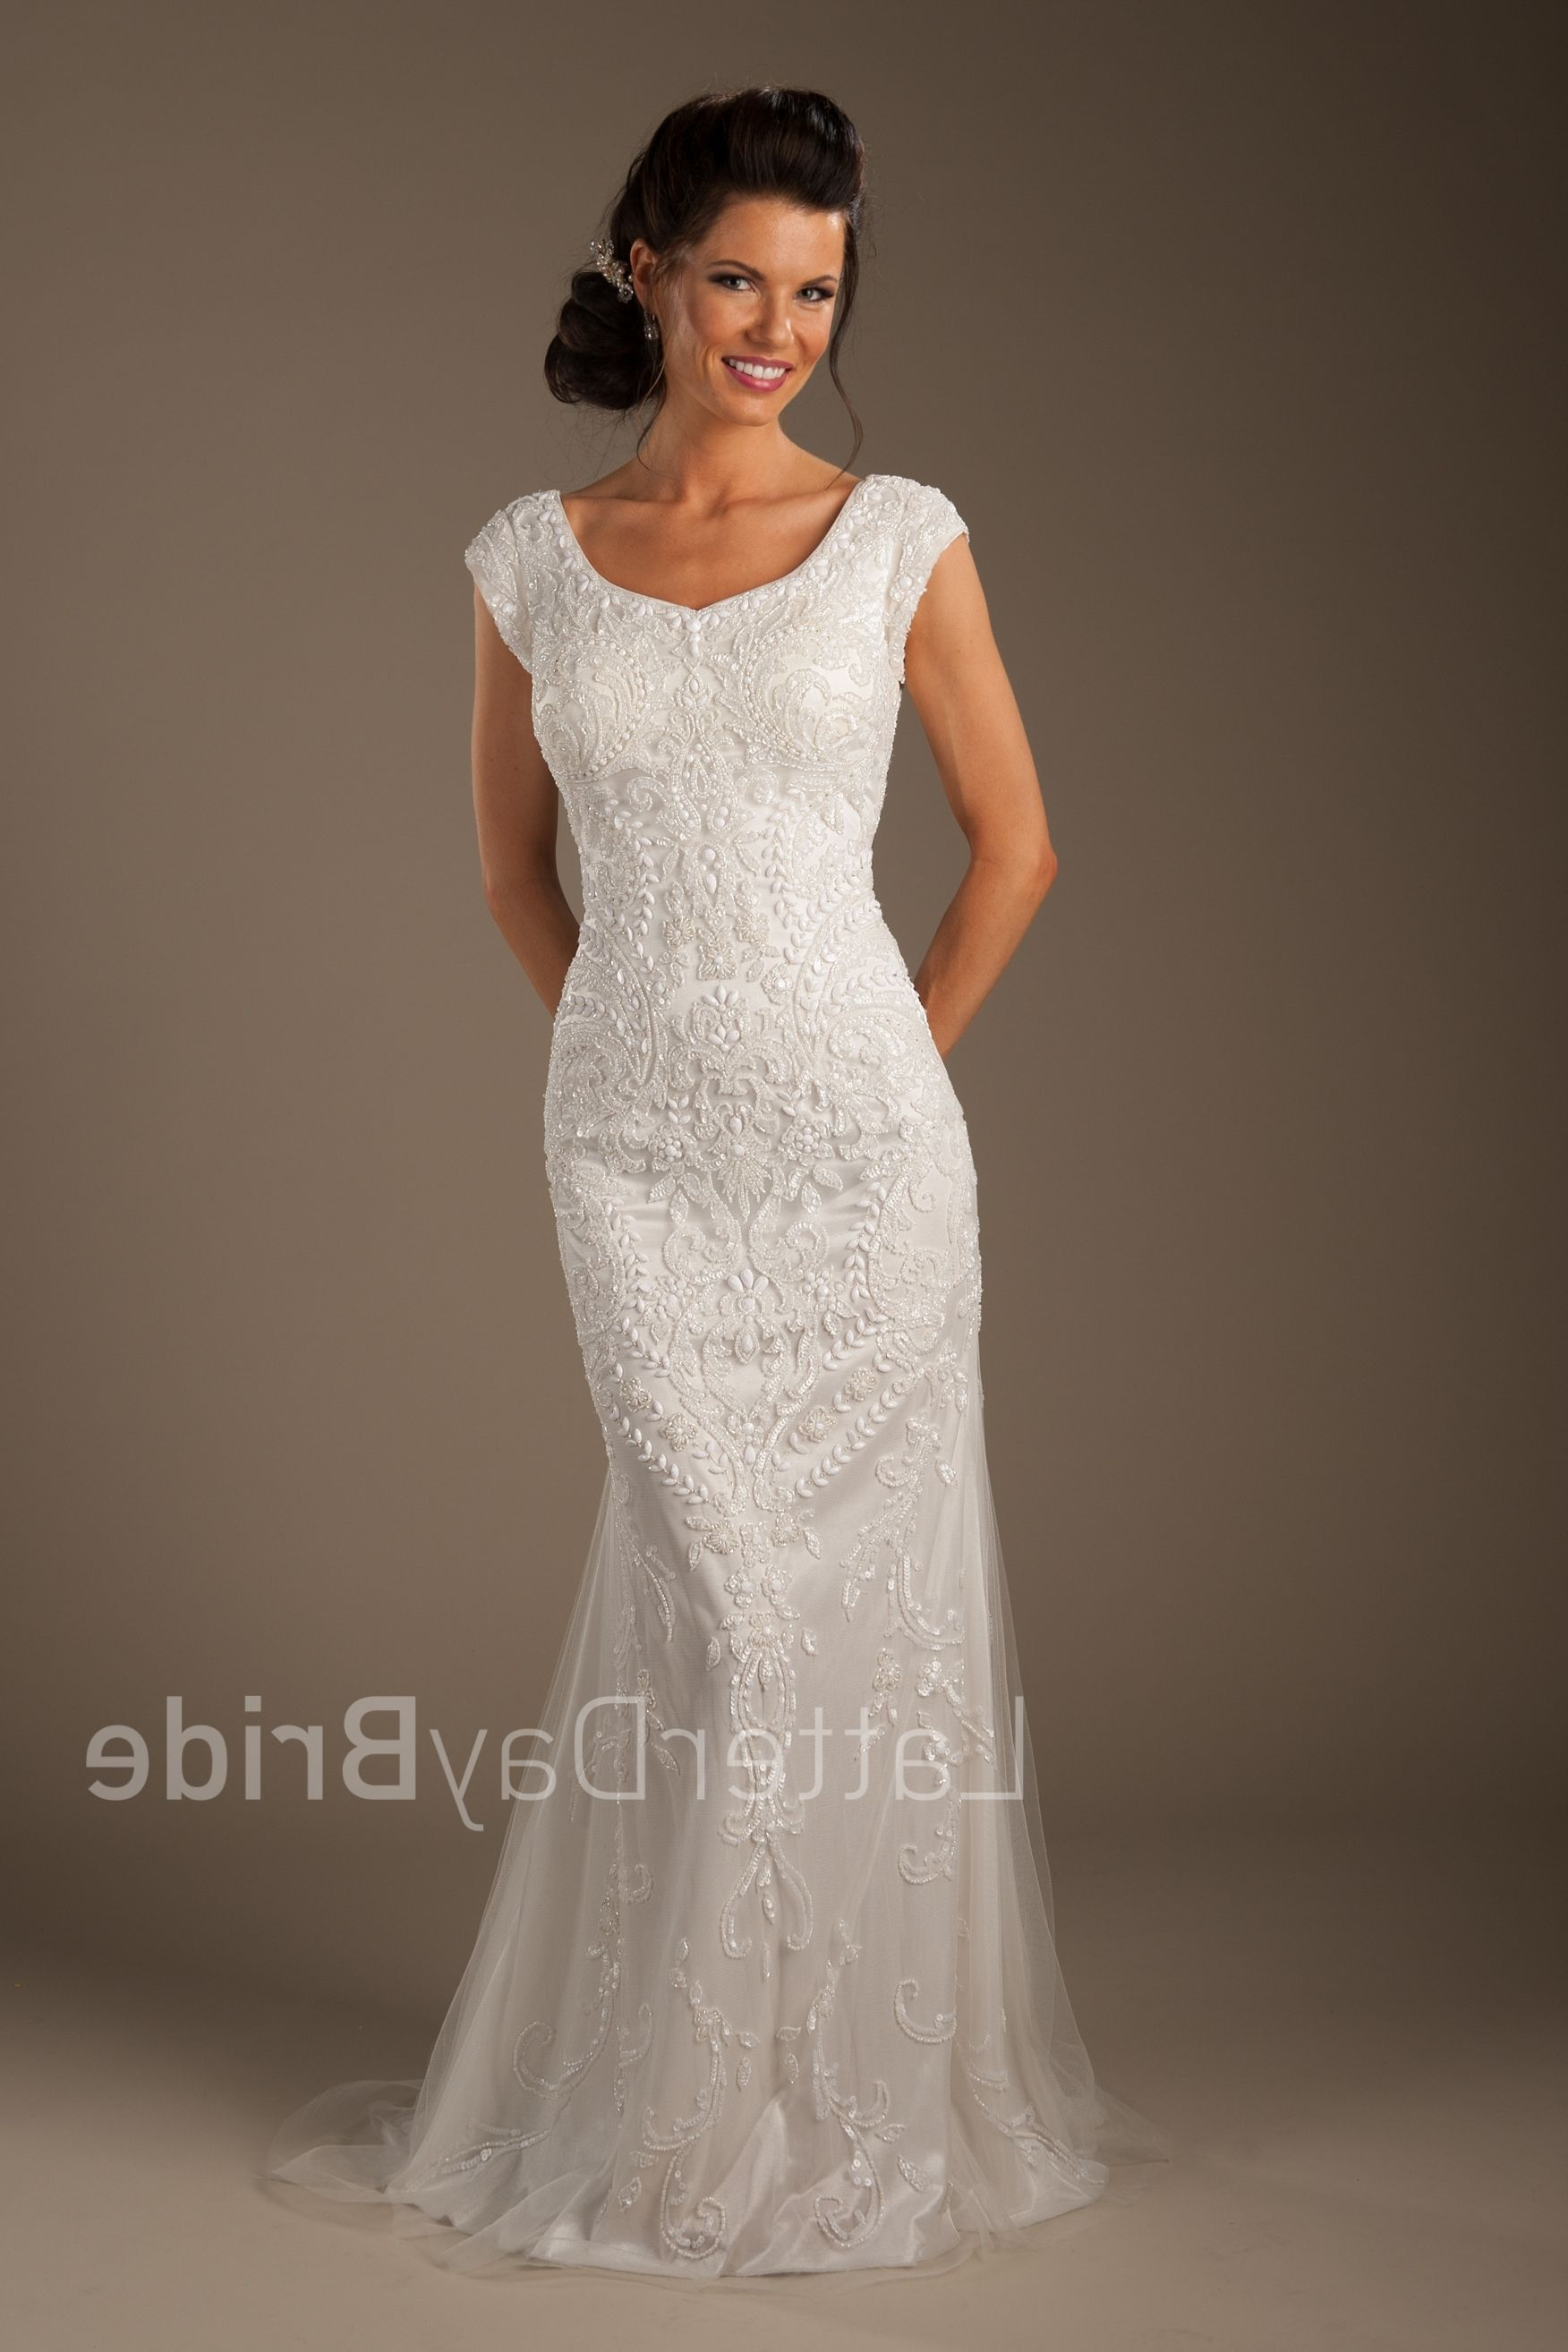 Modest Wedding Dresses Provo Utah